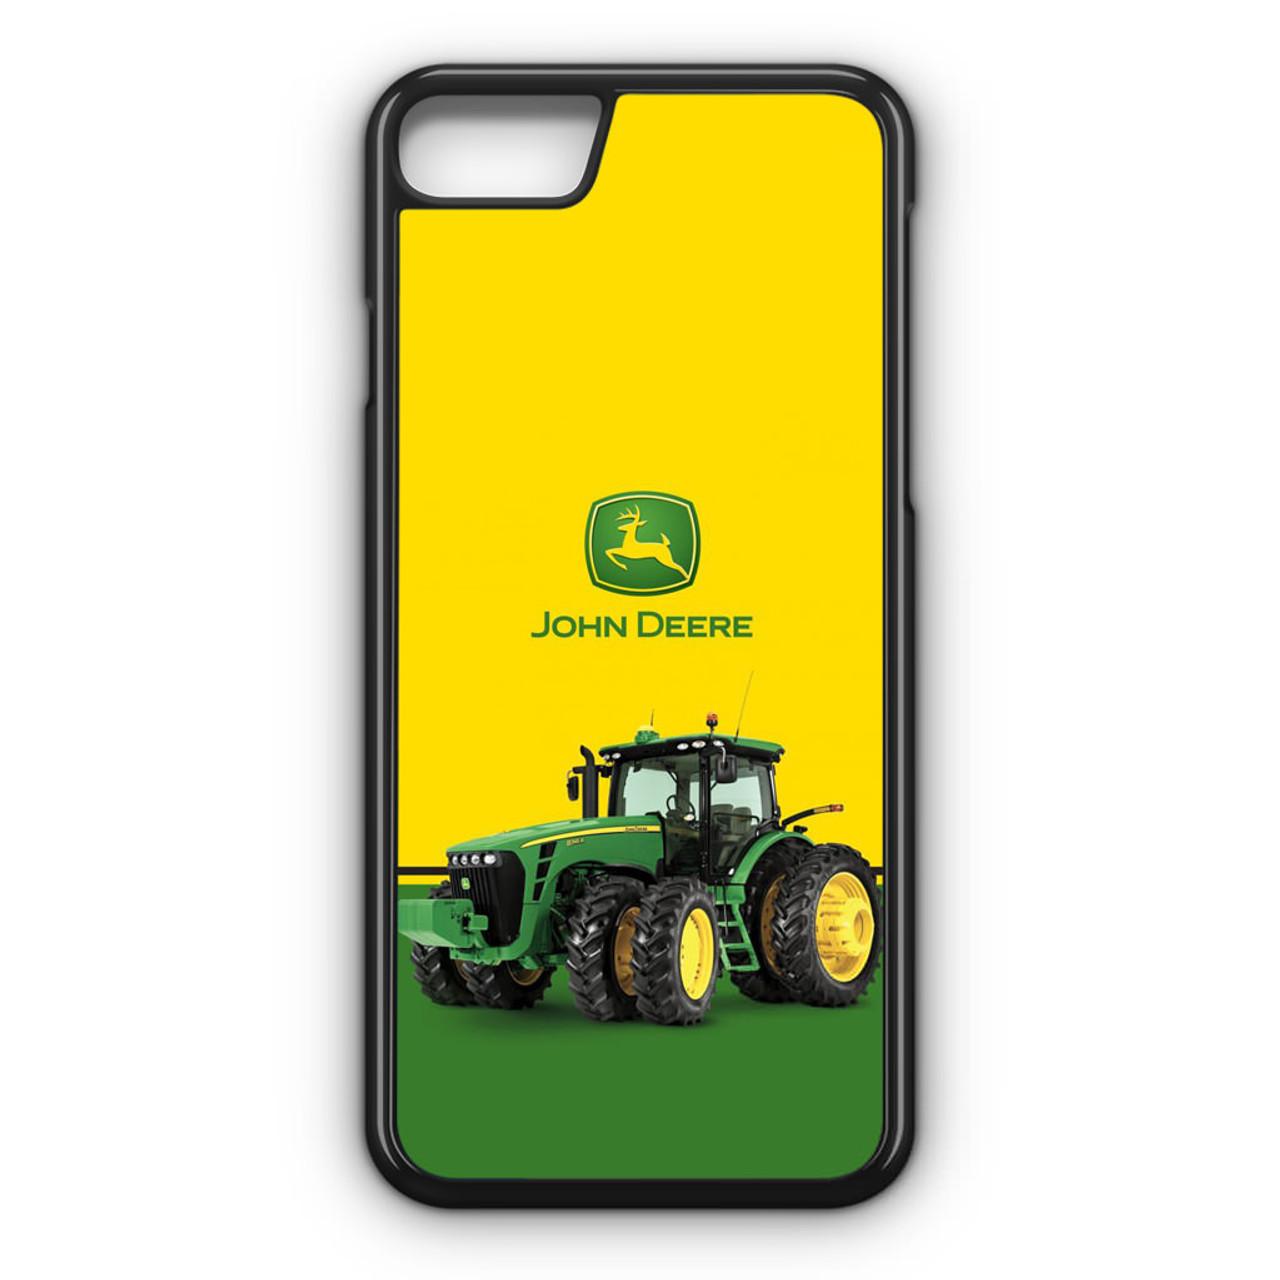 promo code 65798 f4cc7 John Deere Tractor iPhone 7 Case